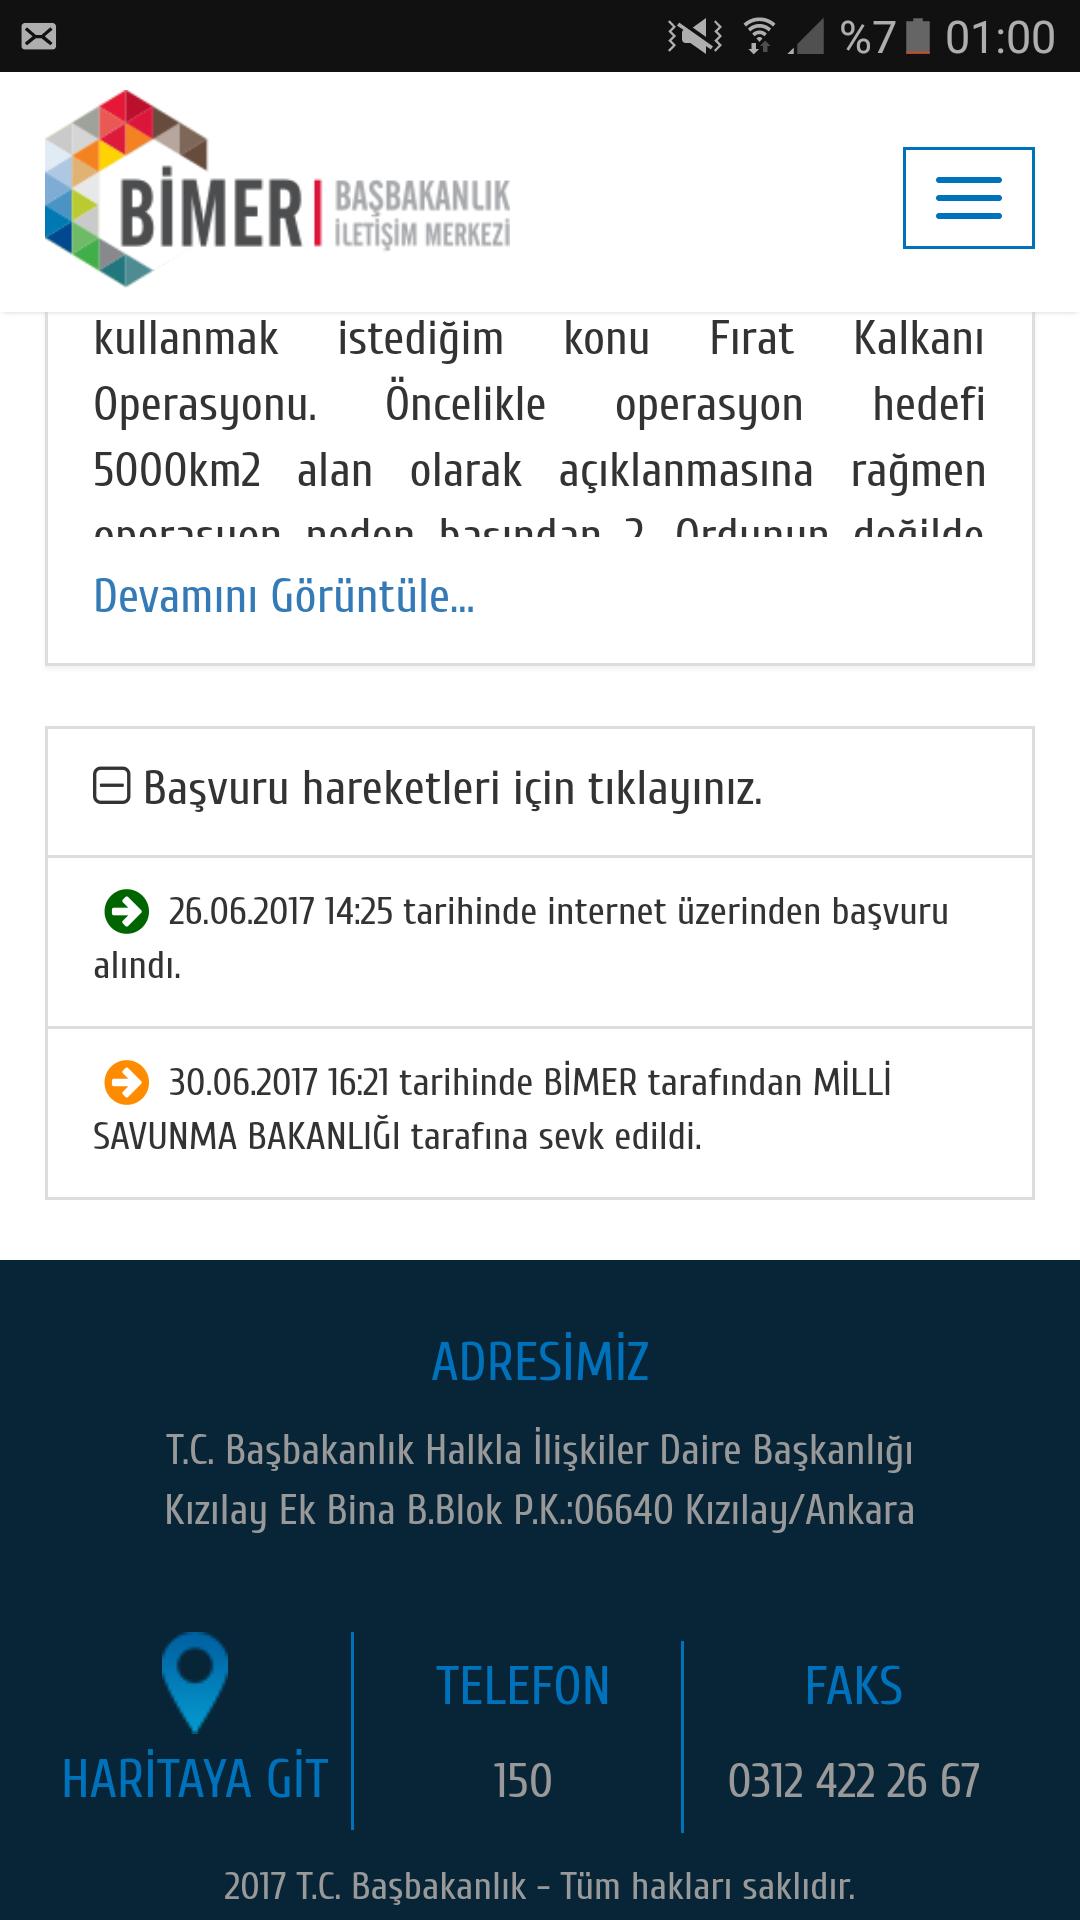 Screenshot 20170701 010026